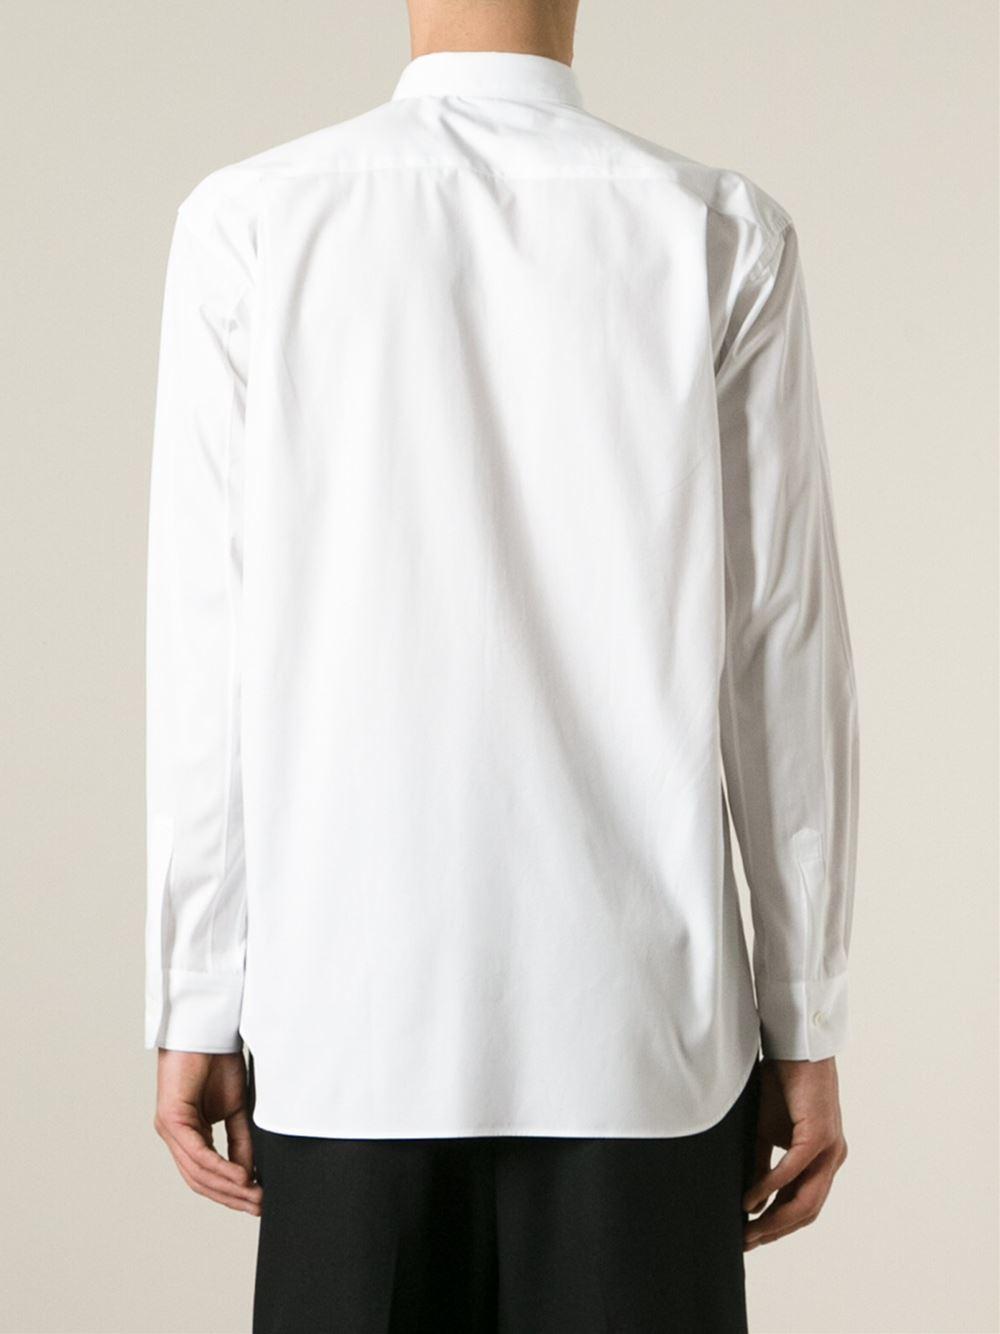 comme des gar ons printed ruffled shirt in white for men. Black Bedroom Furniture Sets. Home Design Ideas